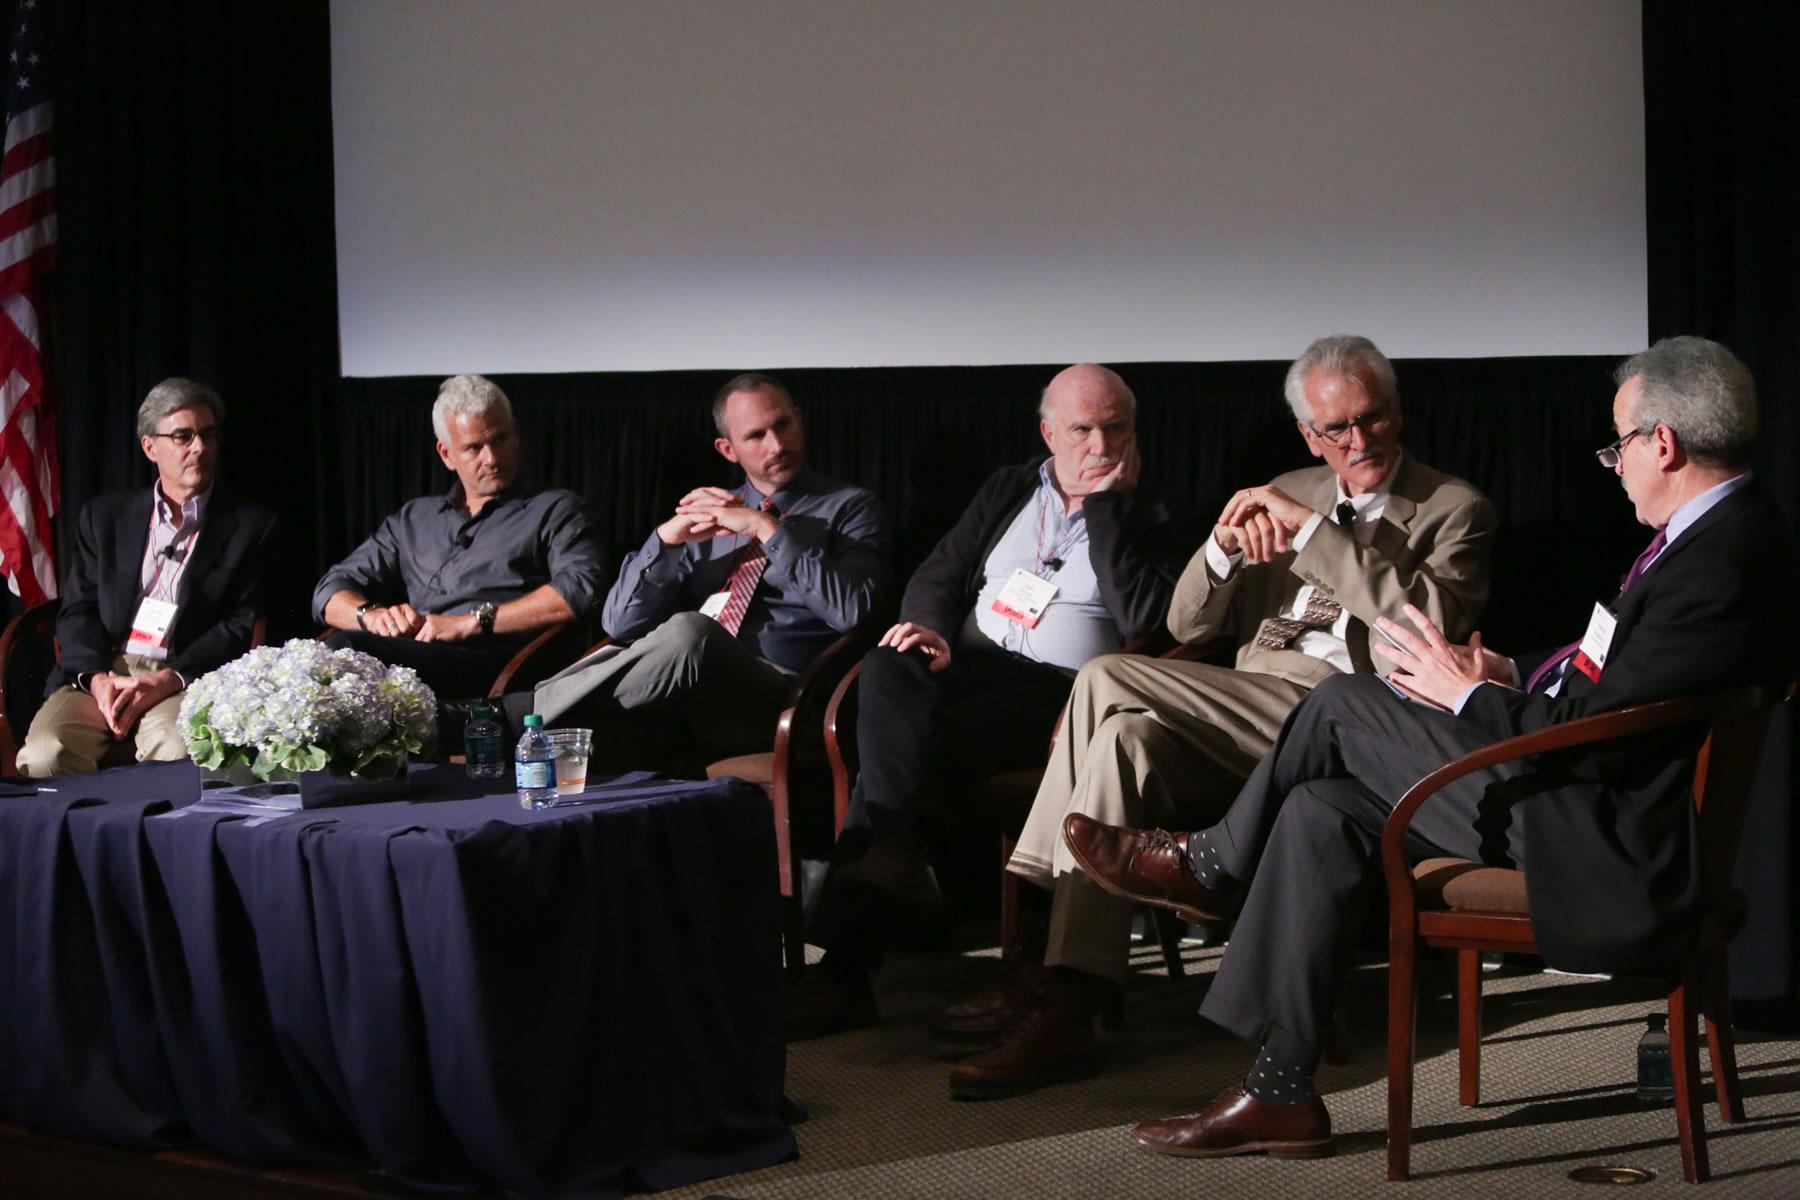 642_Panelists Thomas Robinson, Adam Gazzaley, Jason Chein, Dan Romer, Charles Czeisler, Moderator, Harold Koplewicz